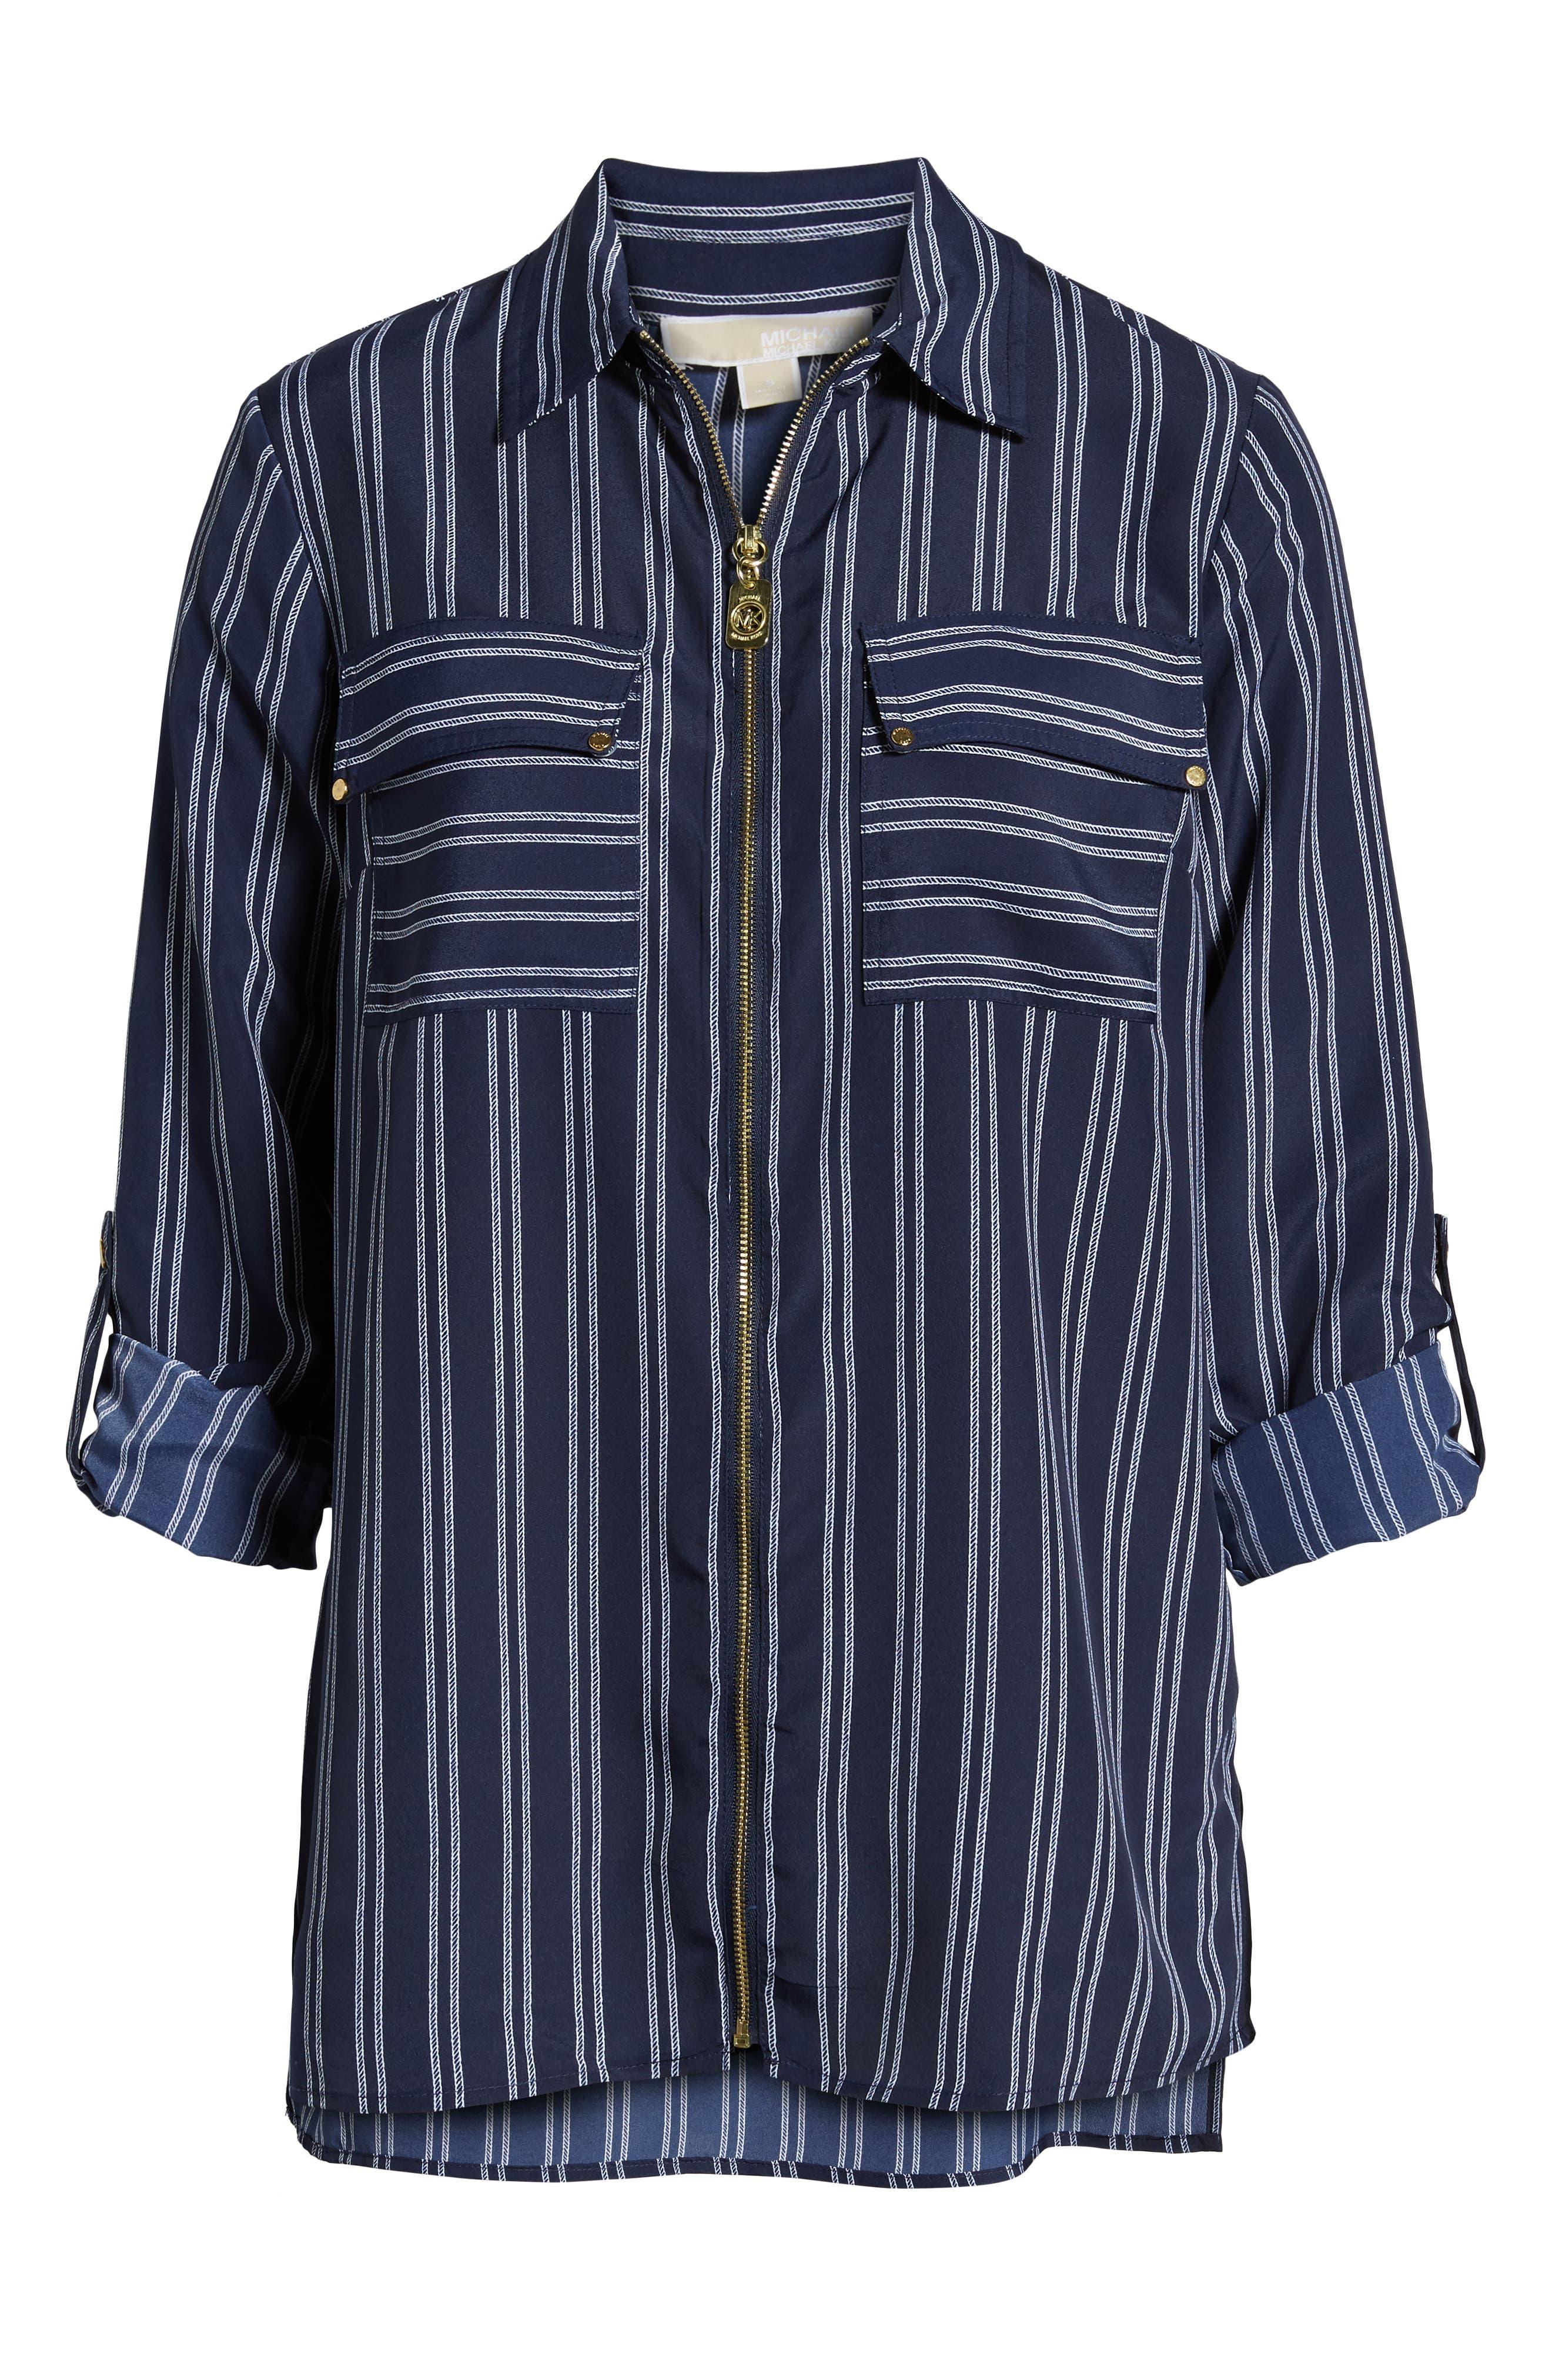 MICHAEL Michael Kors Bengal Striped Shirt,                             Alternate thumbnail 6, color,                             TRUE NAVY